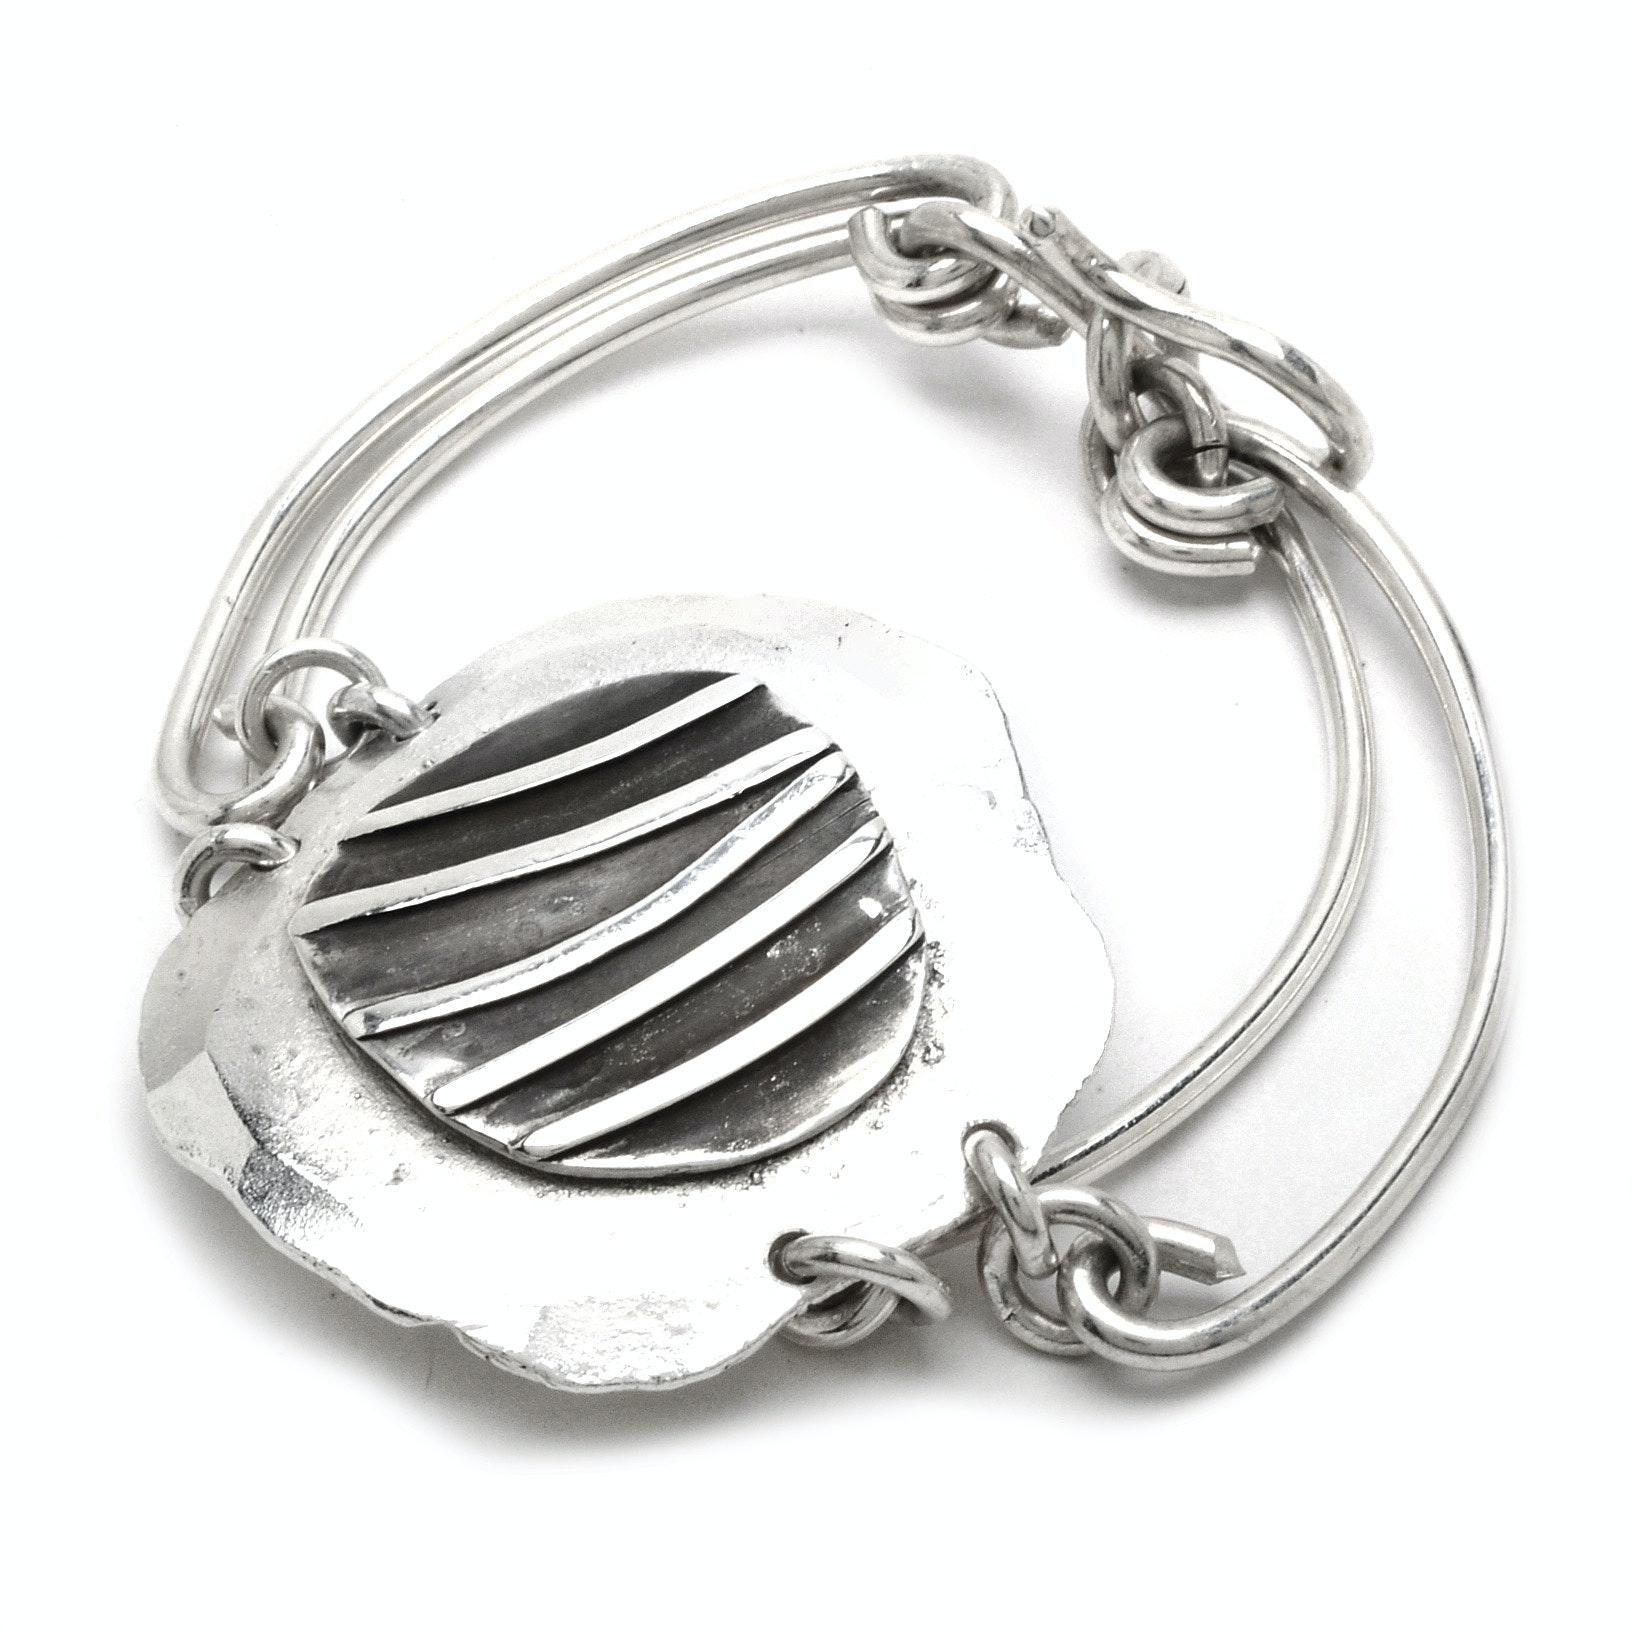 Artisan-Made Fine Sterling Silver Bracelet